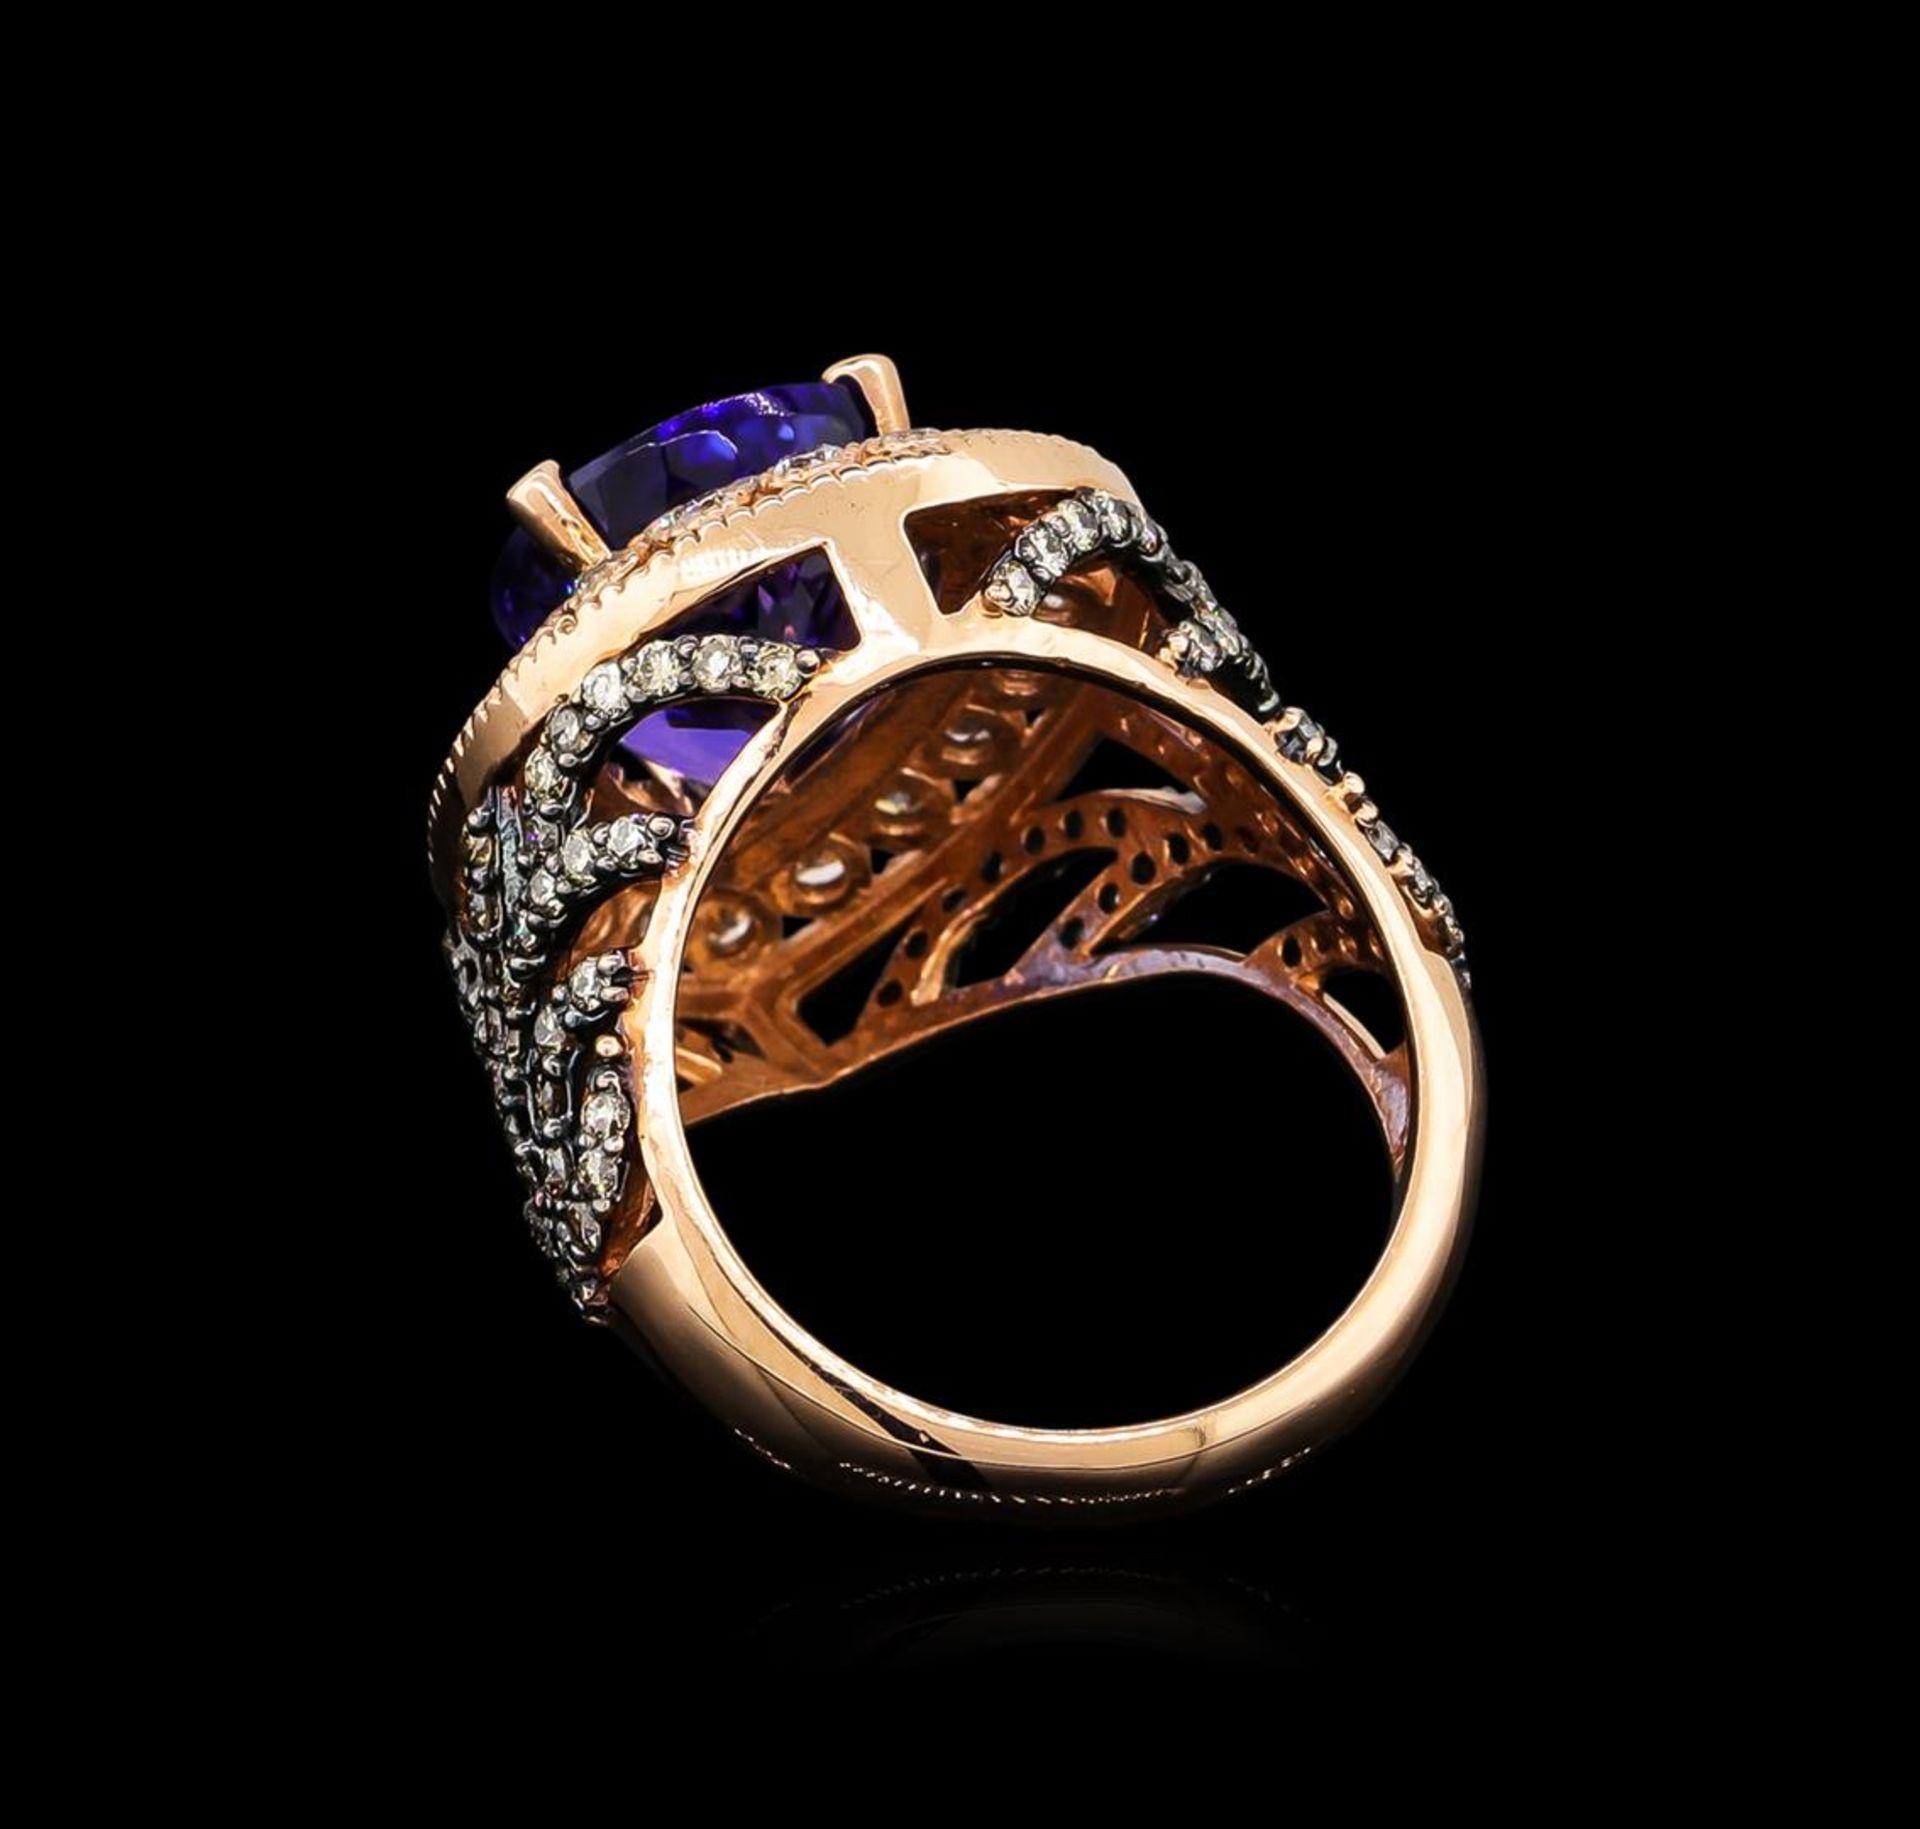 7.31 ctw Tanzanite and Diamond Ring - 14KT Rose Gold - Image 3 of 5